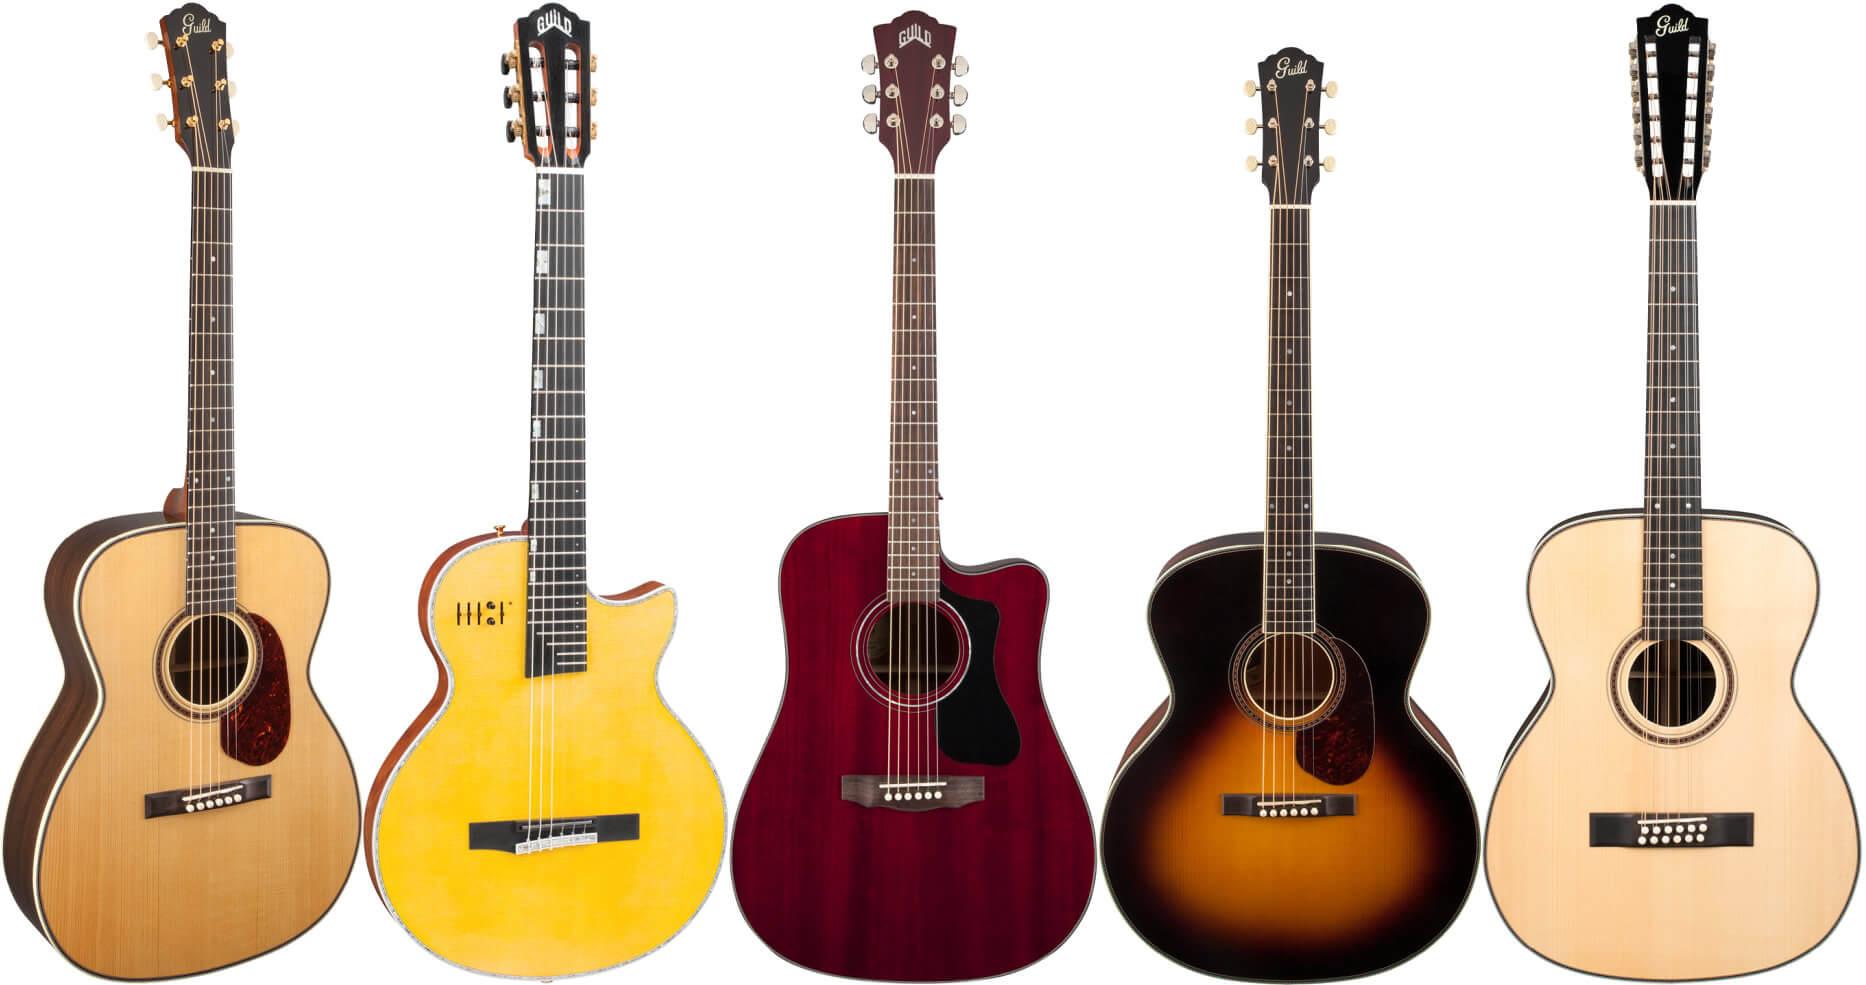 Guild(ギルド)のアコースティックギター